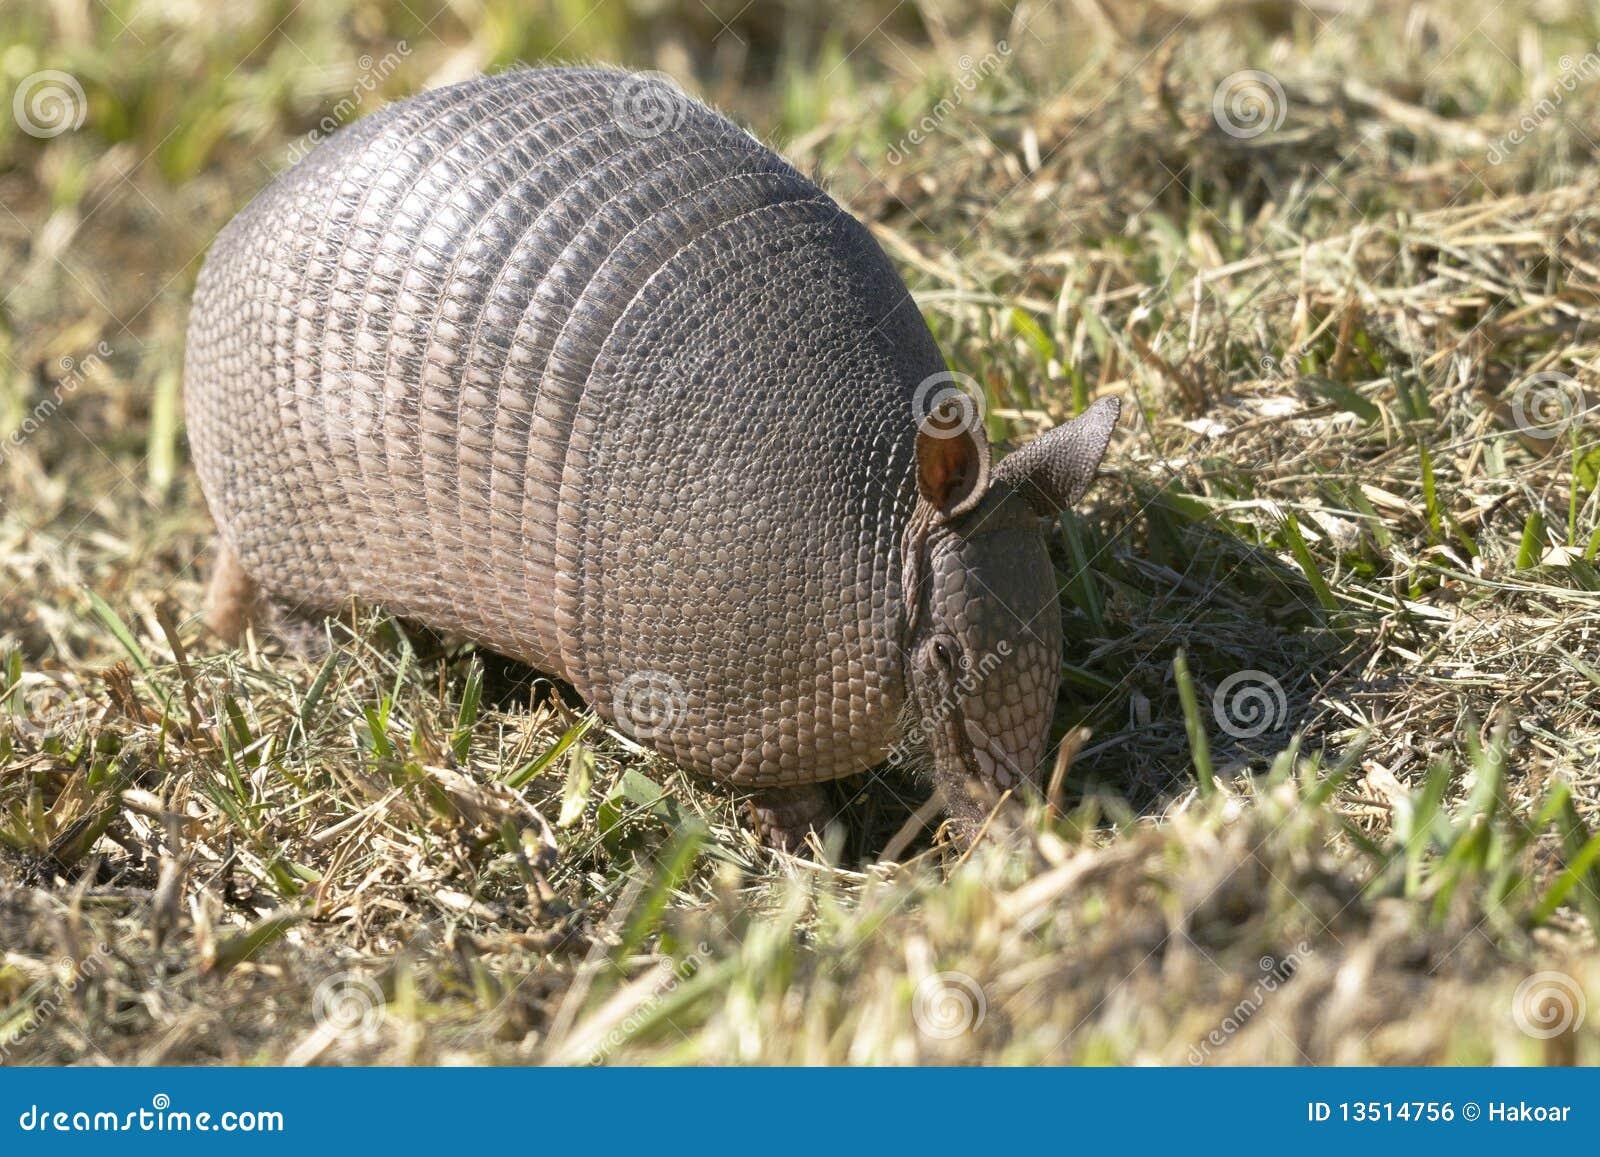 Dasypus novemcinctus, nine-banded armadillo